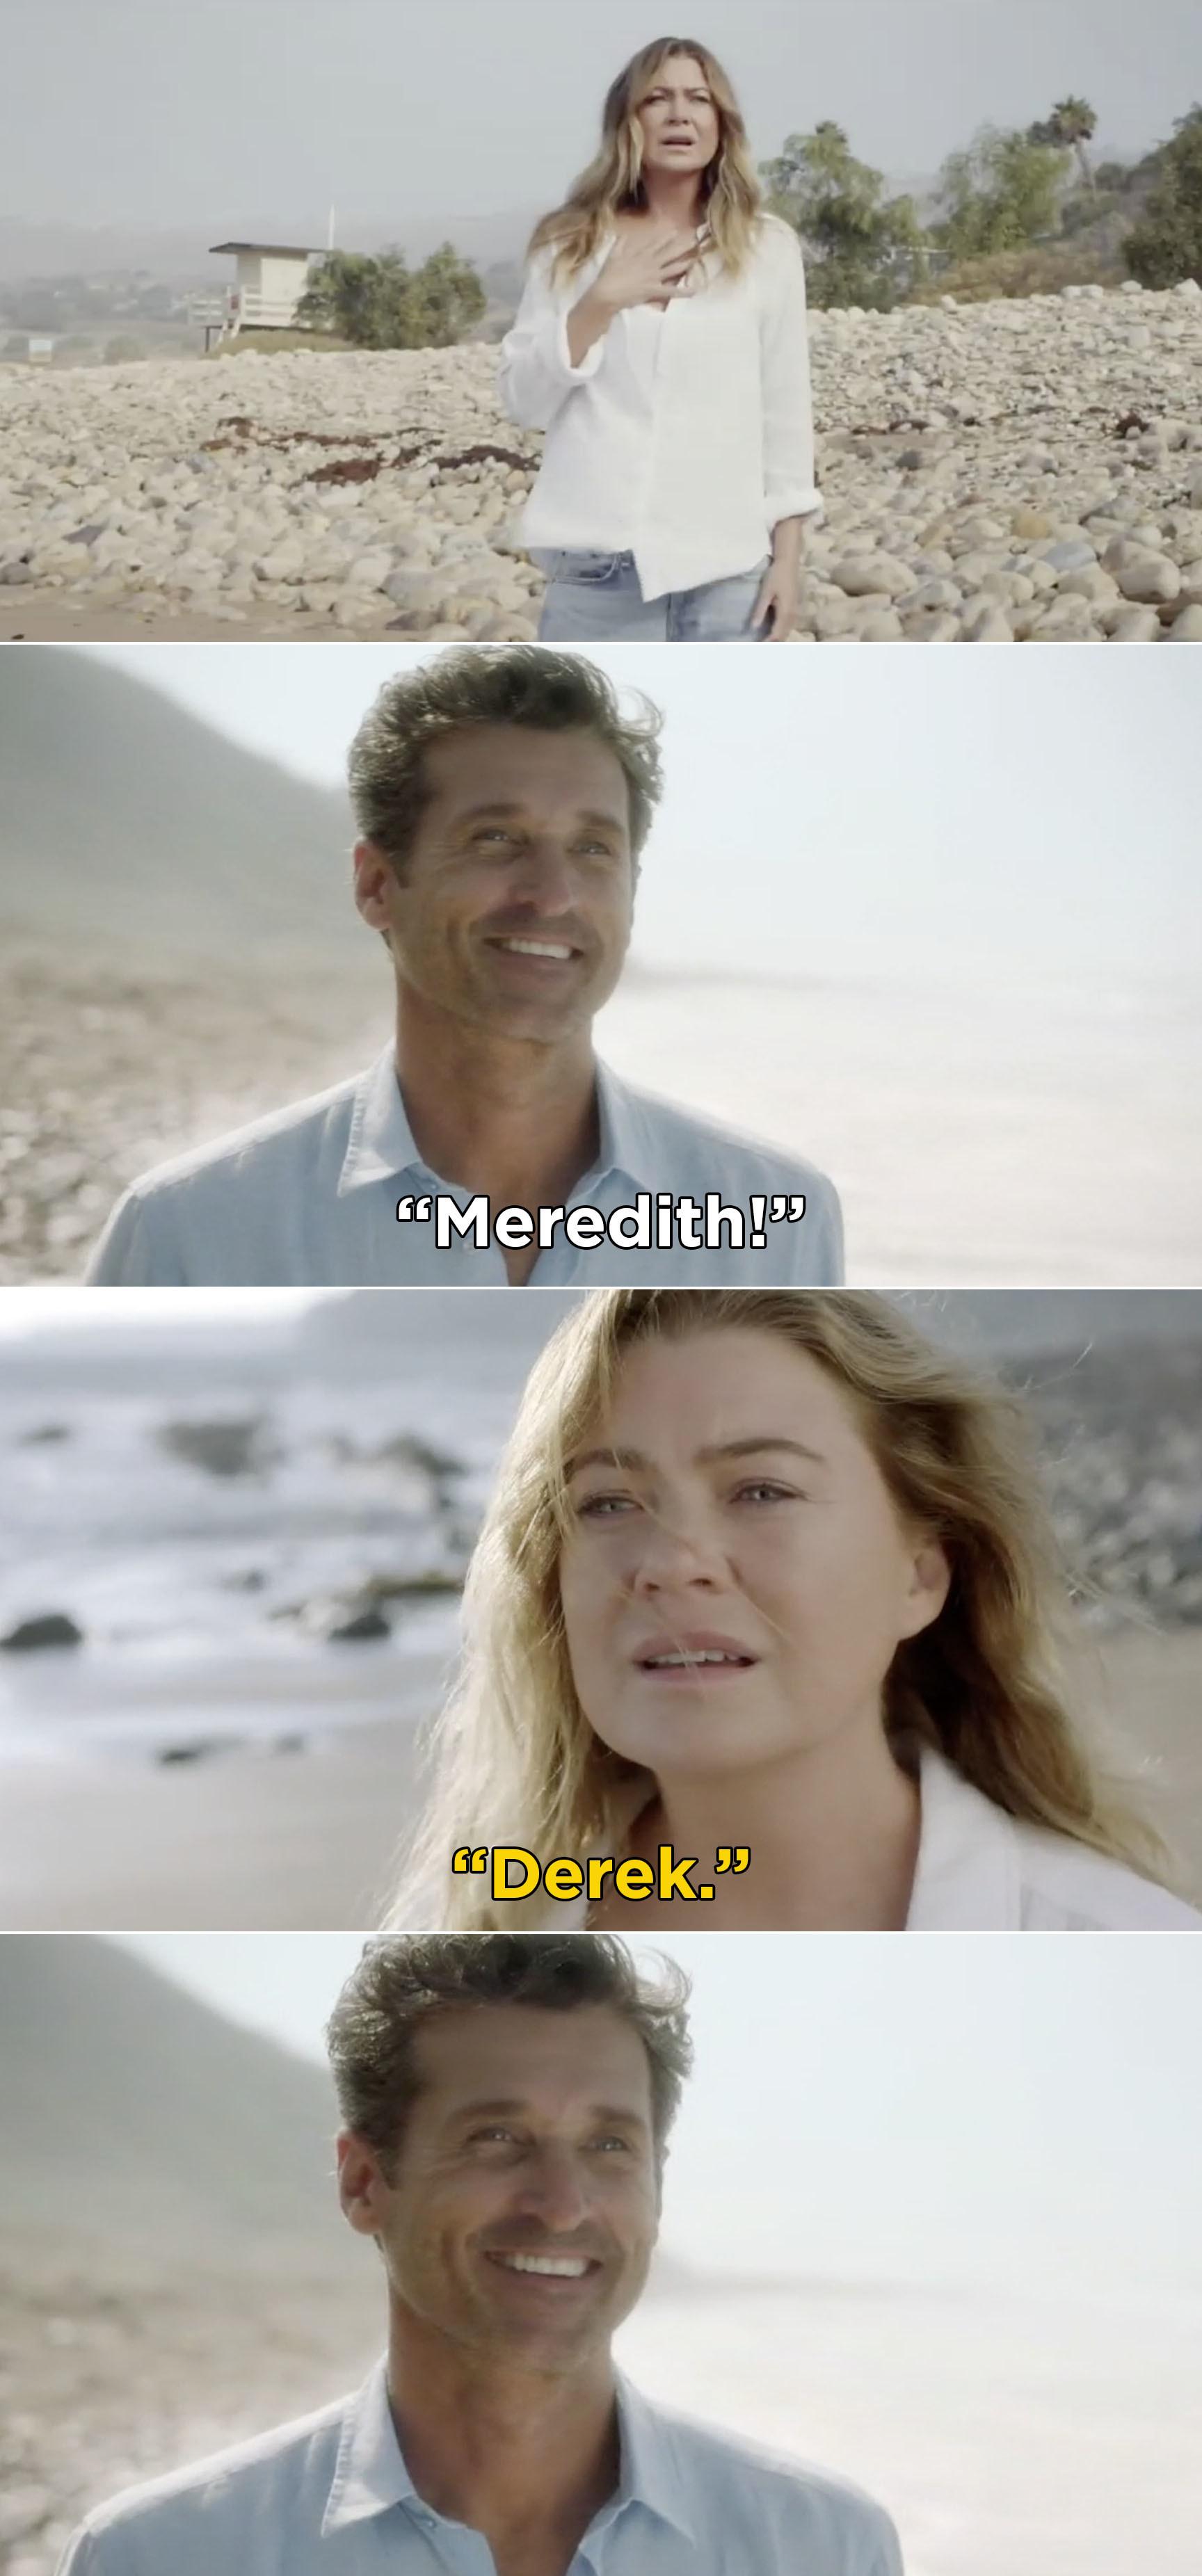 Derek shouting Meredith and Meredith shouting Derek after seeing him on a beach